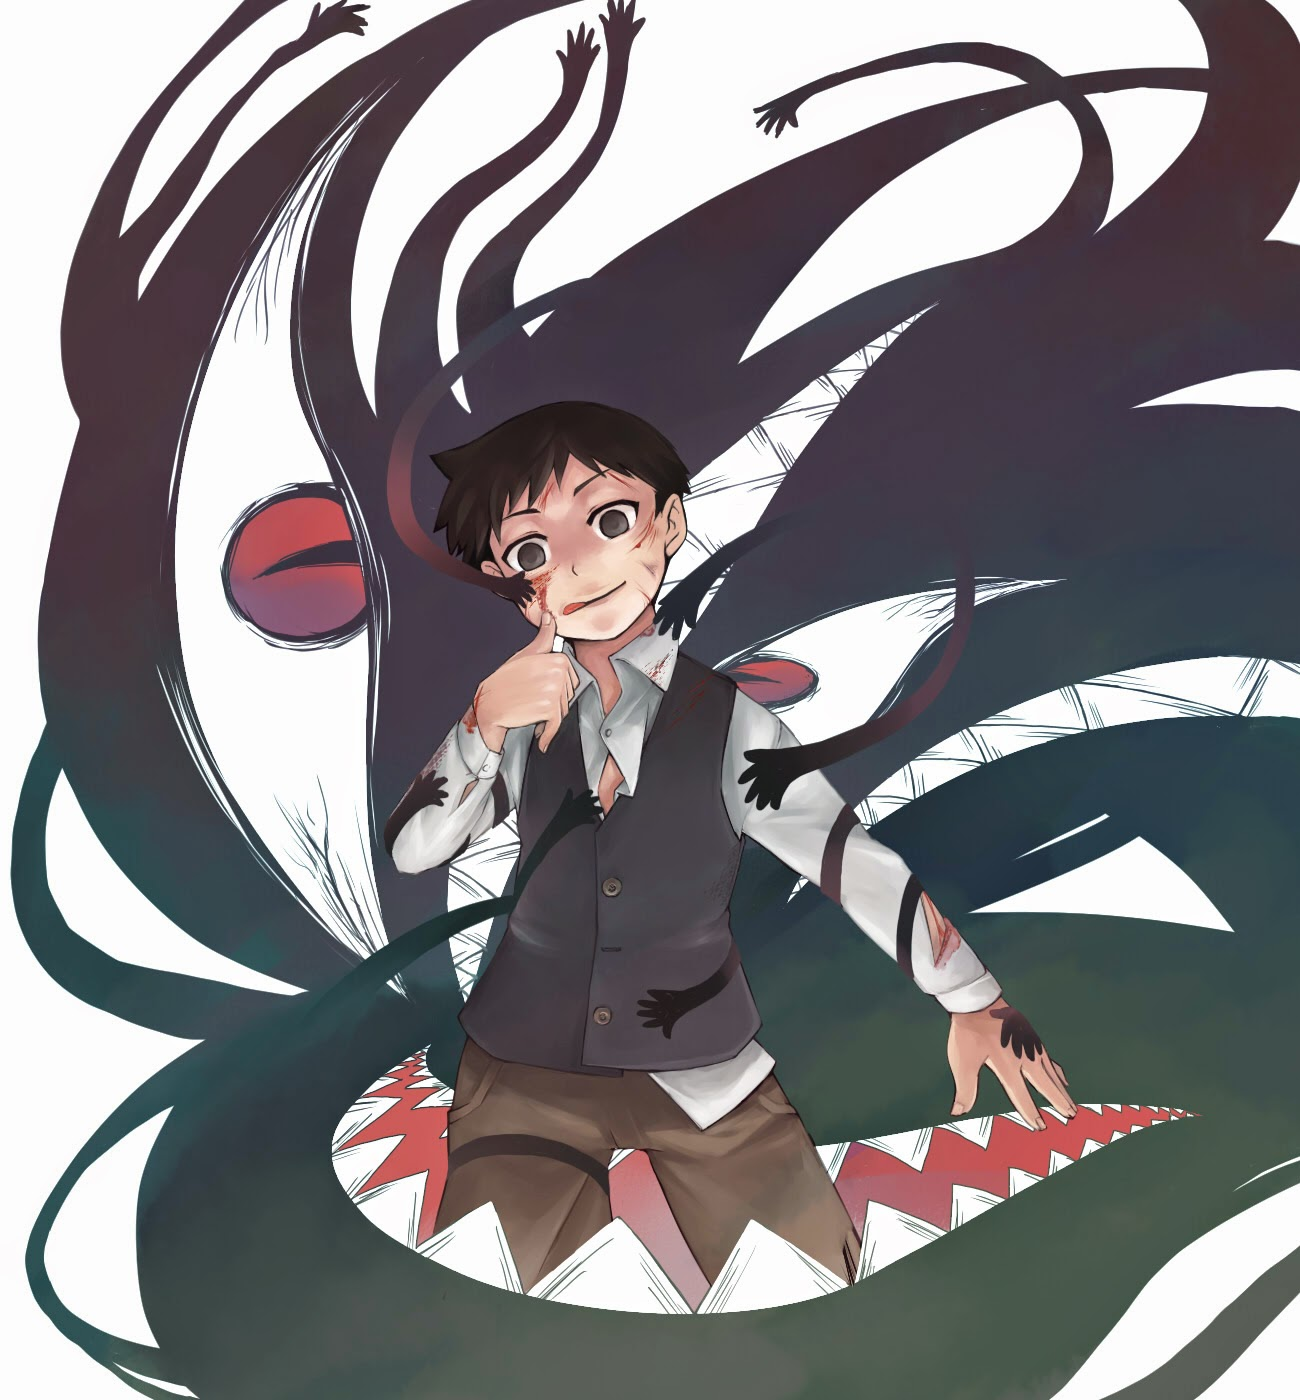 Pride (Fullmetal Alchemist)